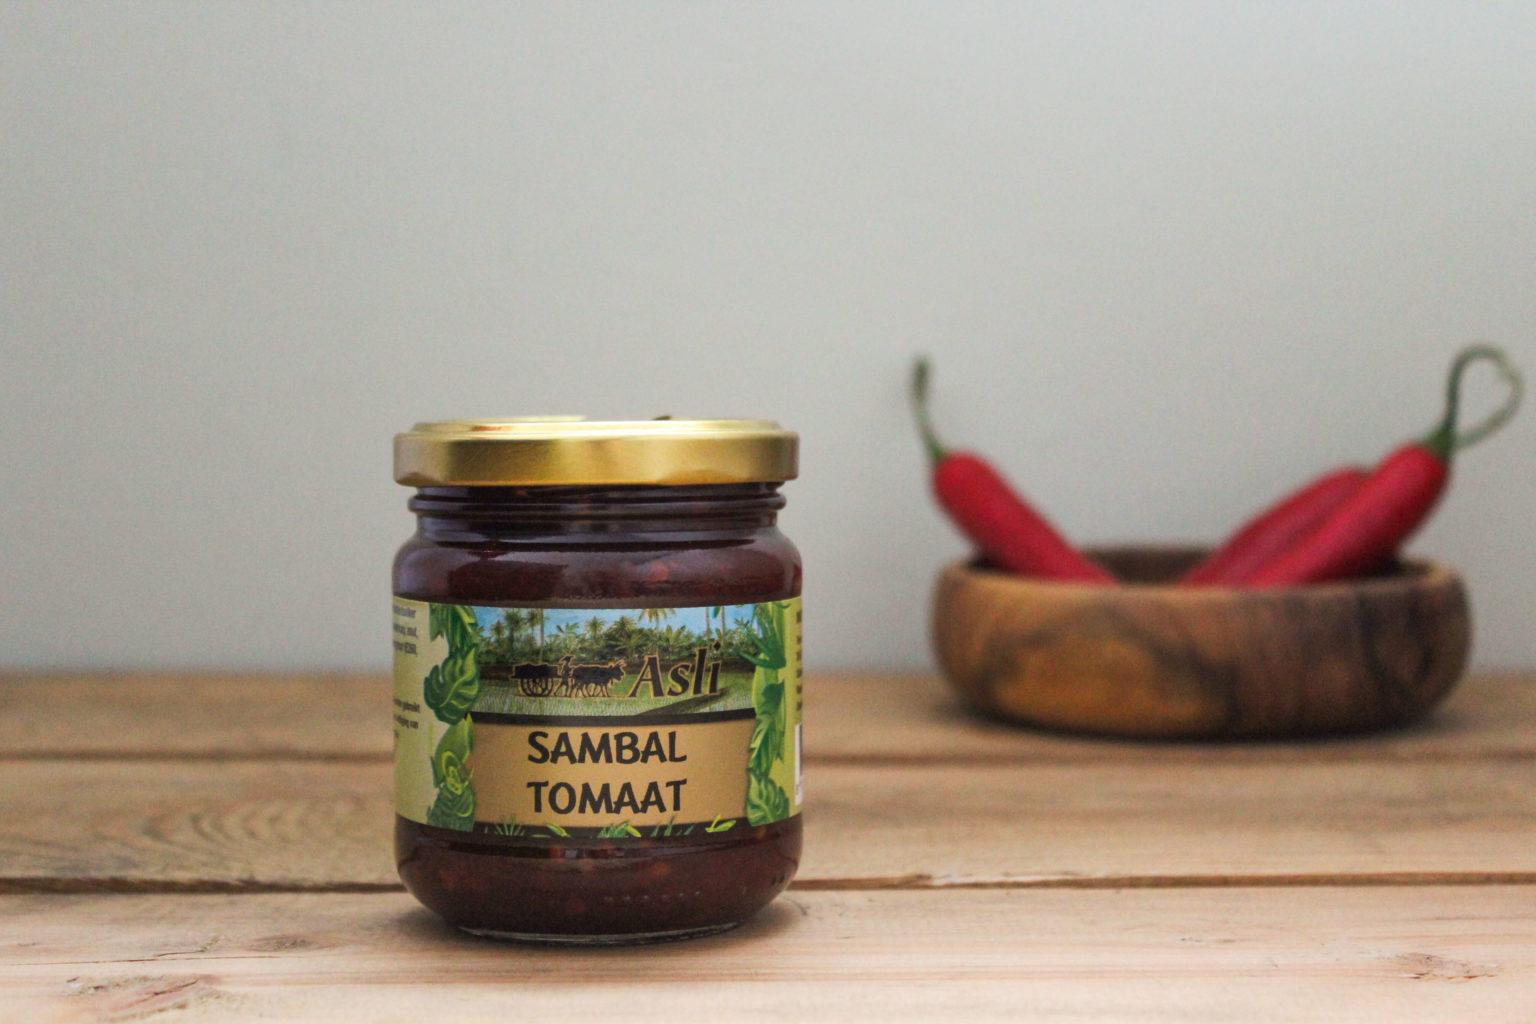 Sambal Tomaat